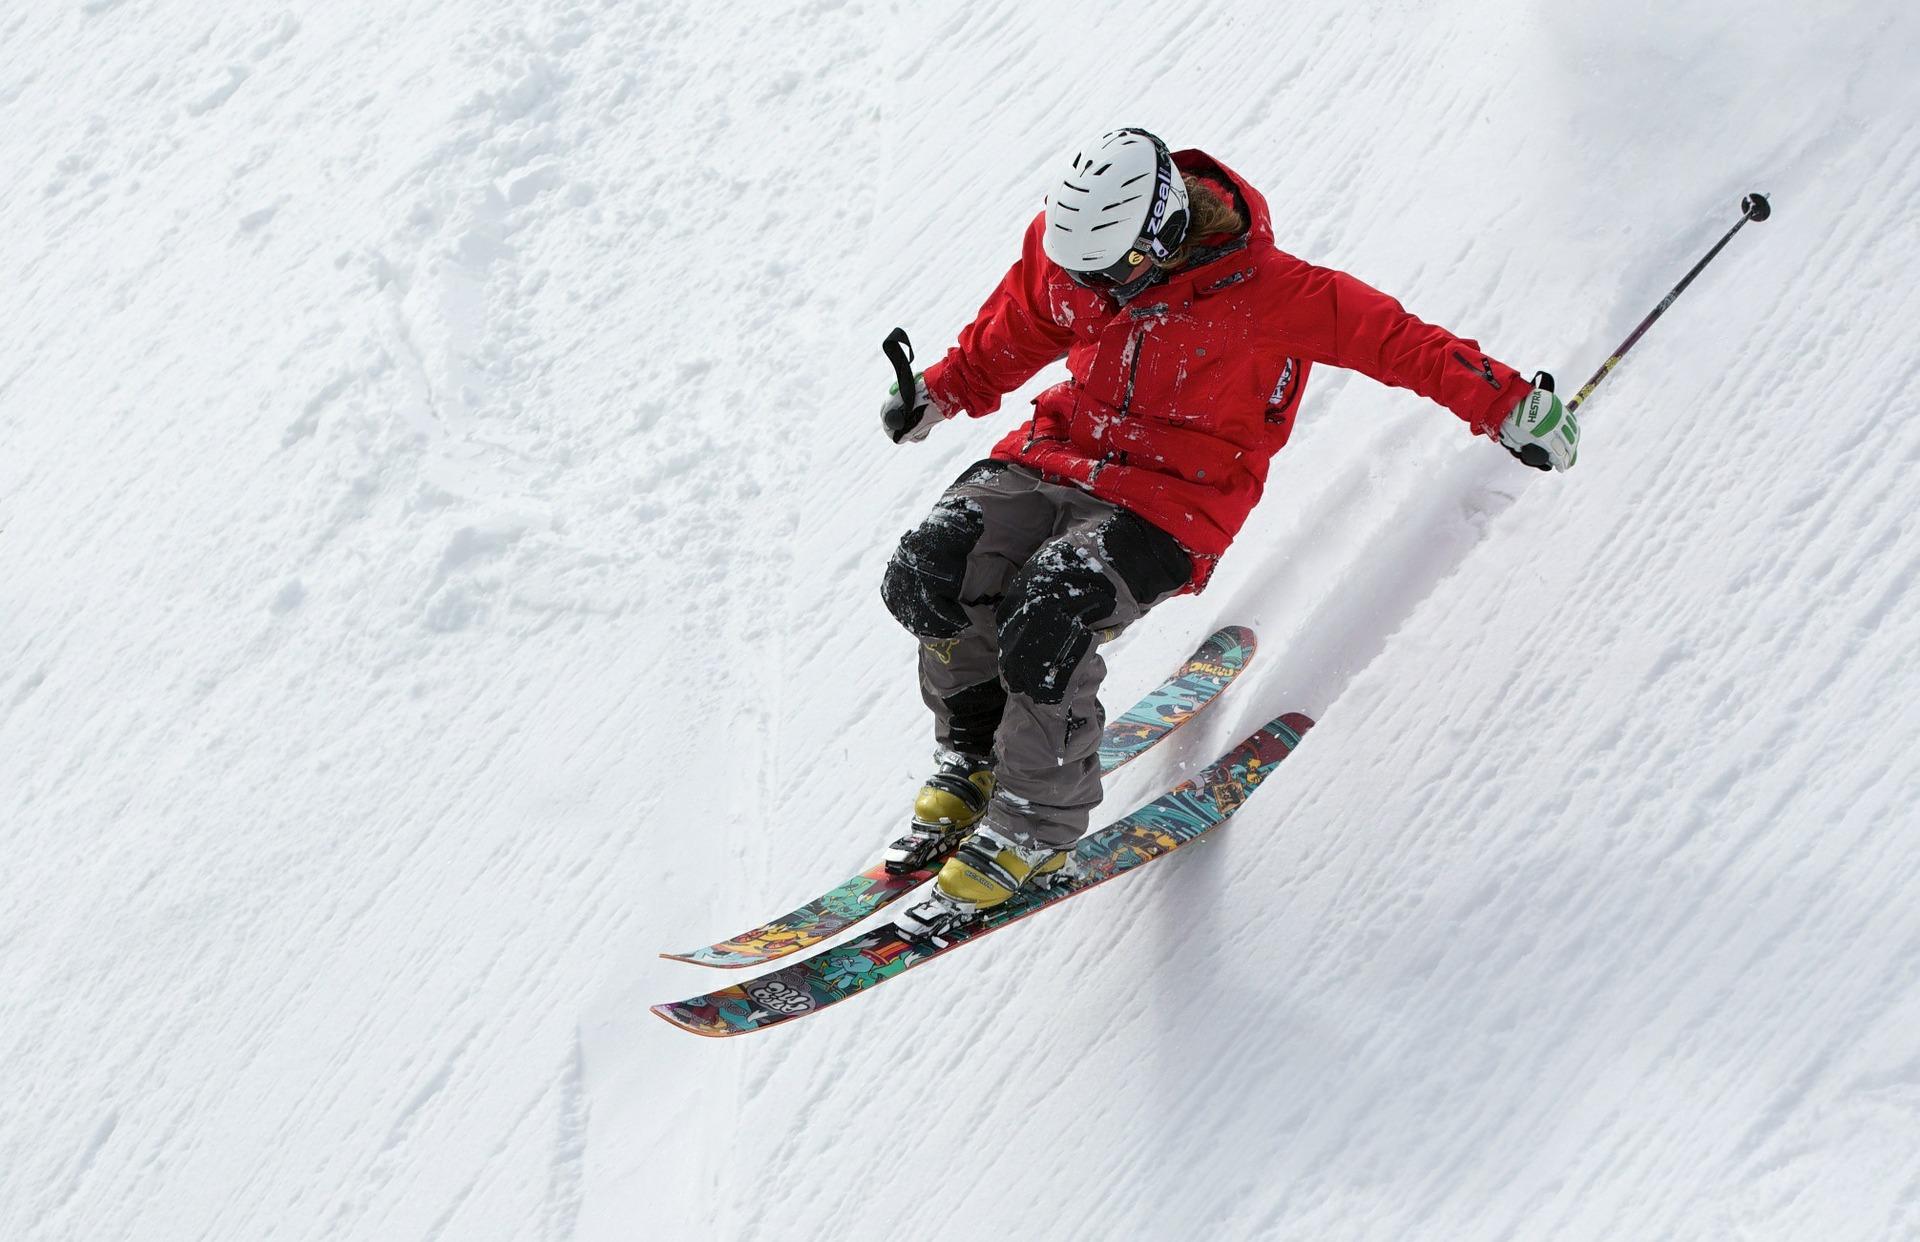 Ski fahren in Dubai & Badeurlaub in Ras Al Khaimah ab 889,00€